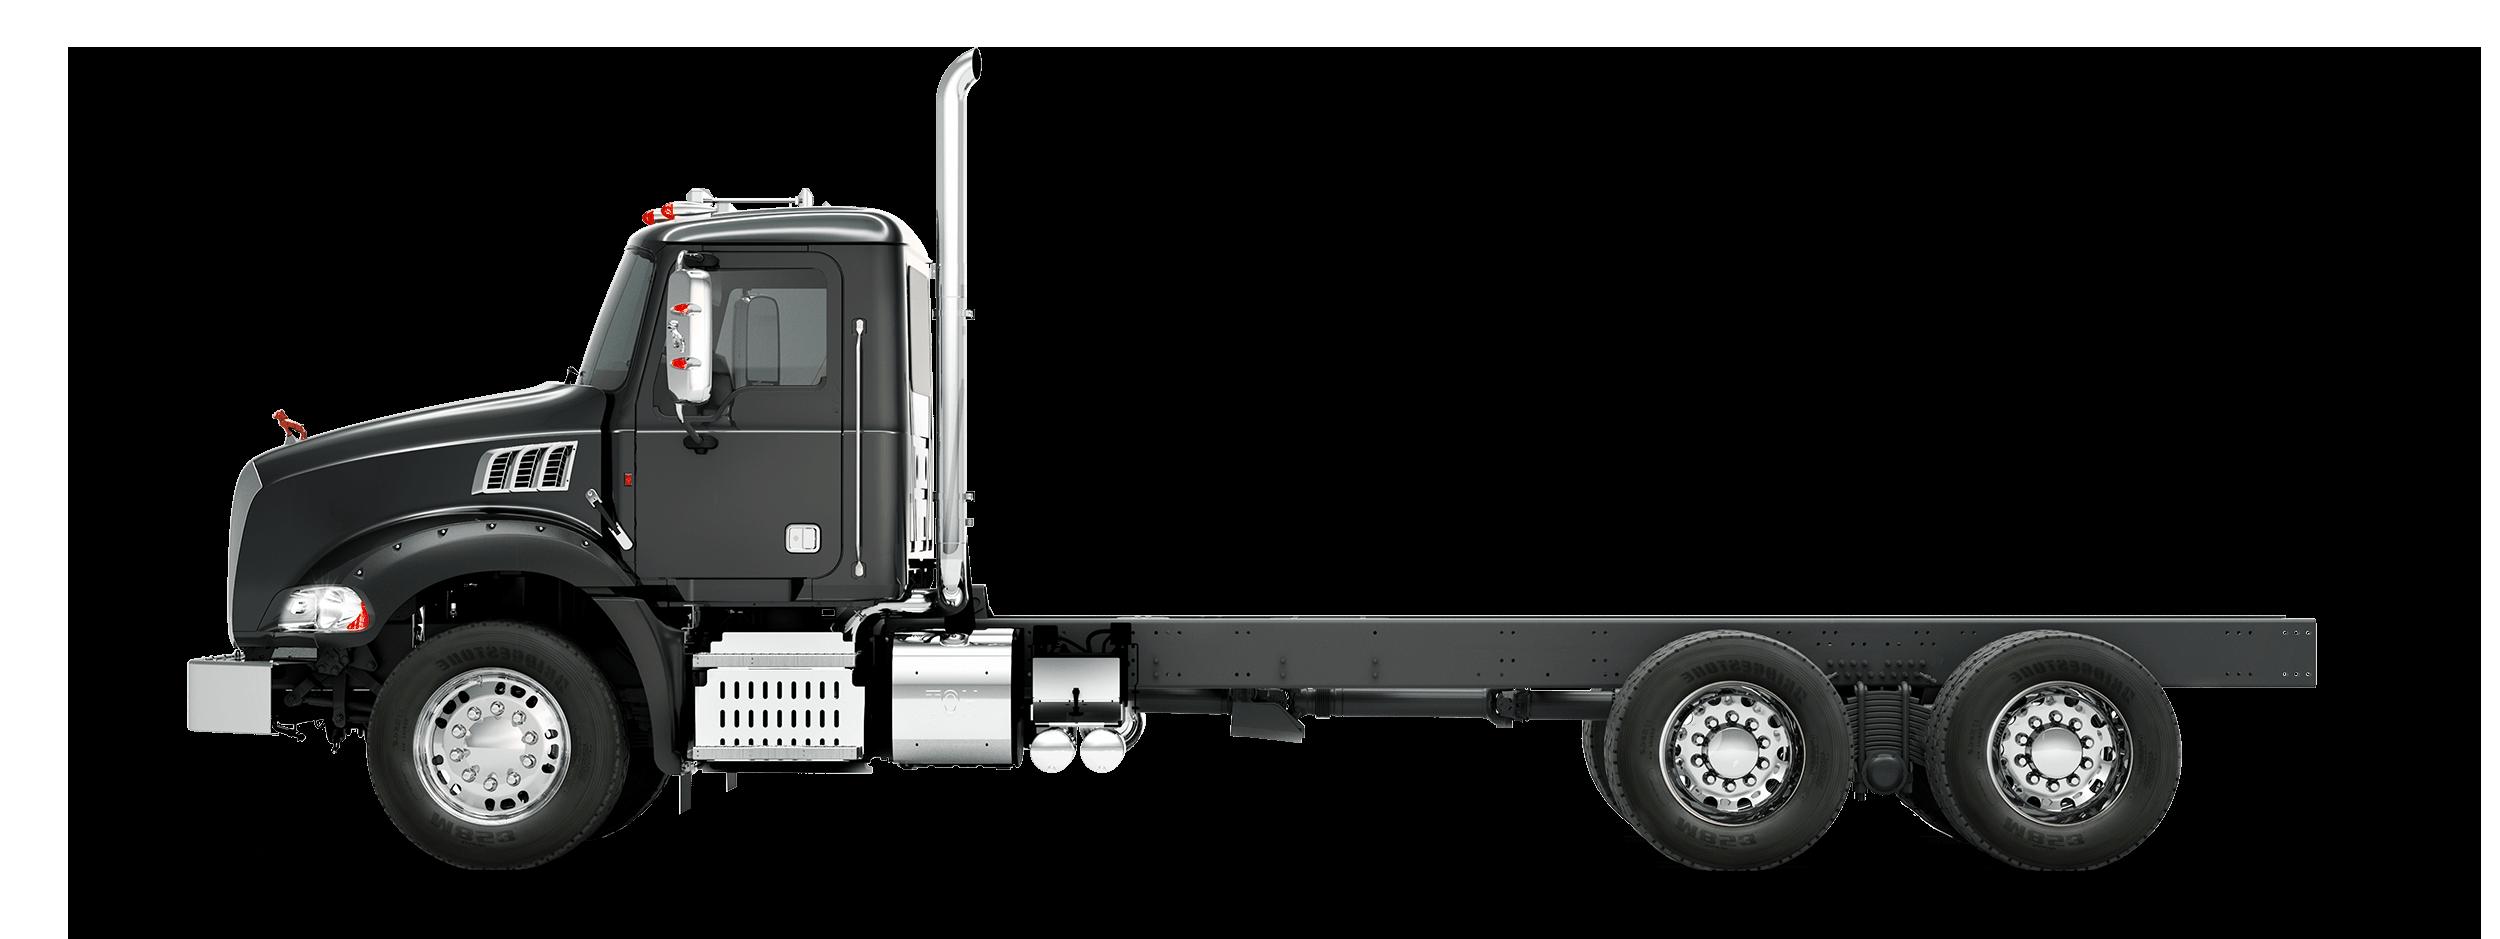 zenith_insurance_truck_insurance